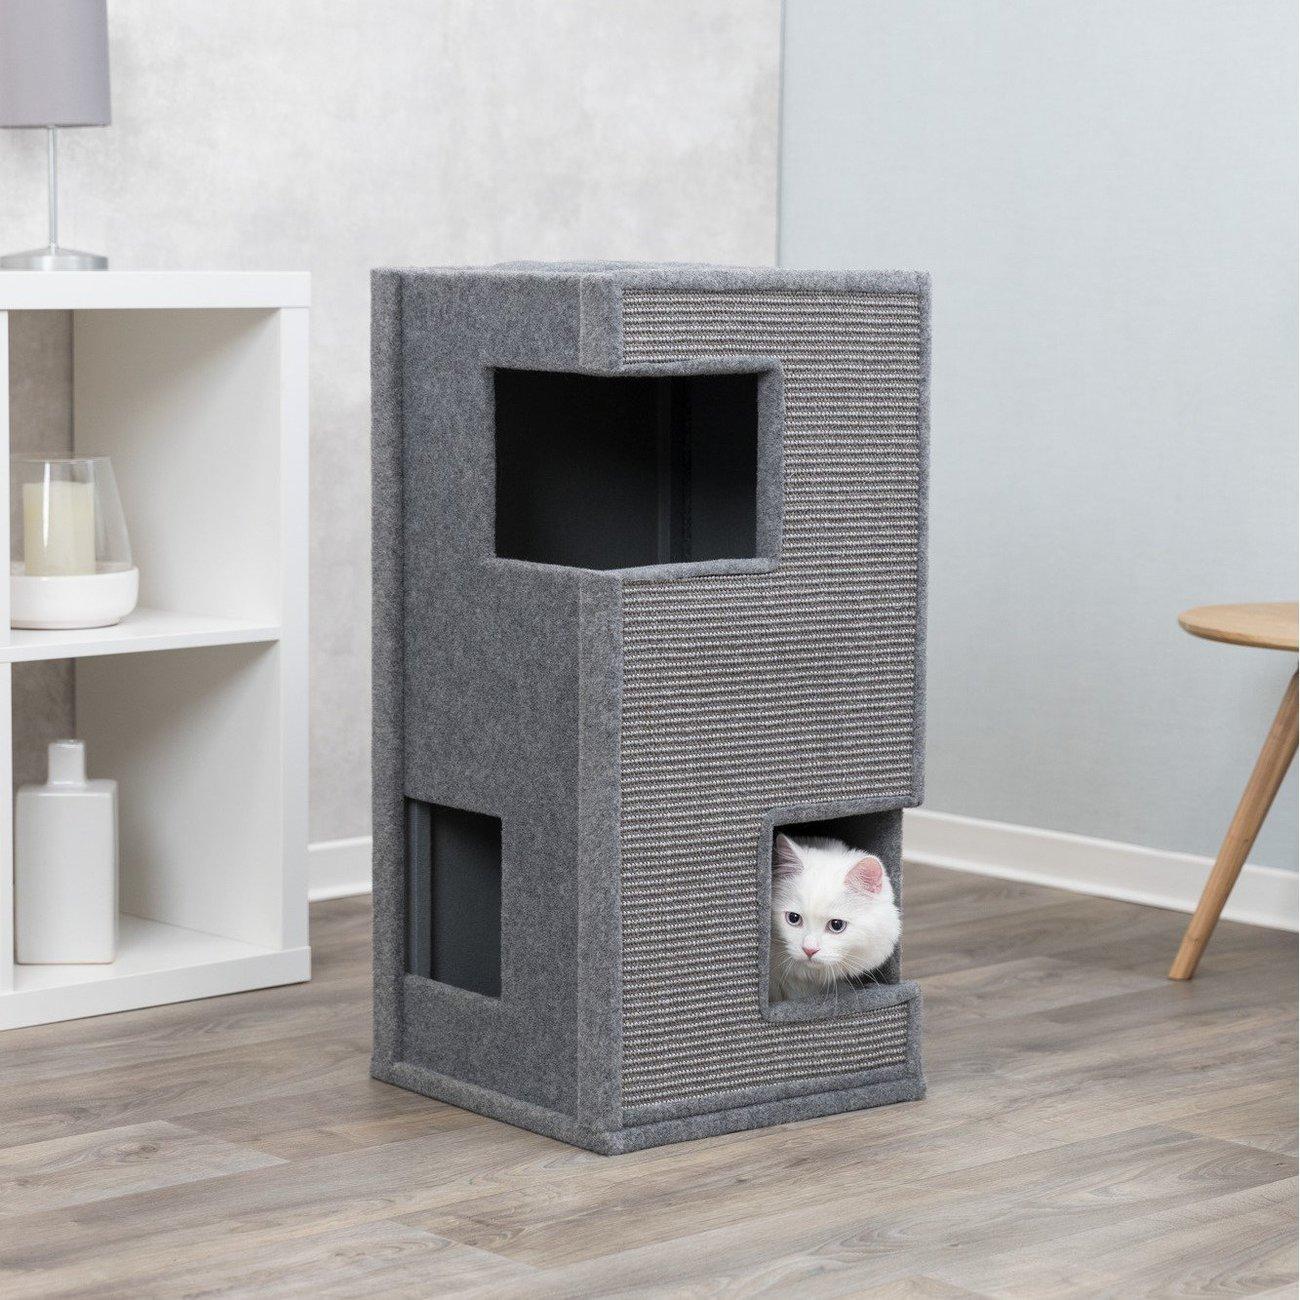 TRIXIE Cat Tower Gabriel Preview Image